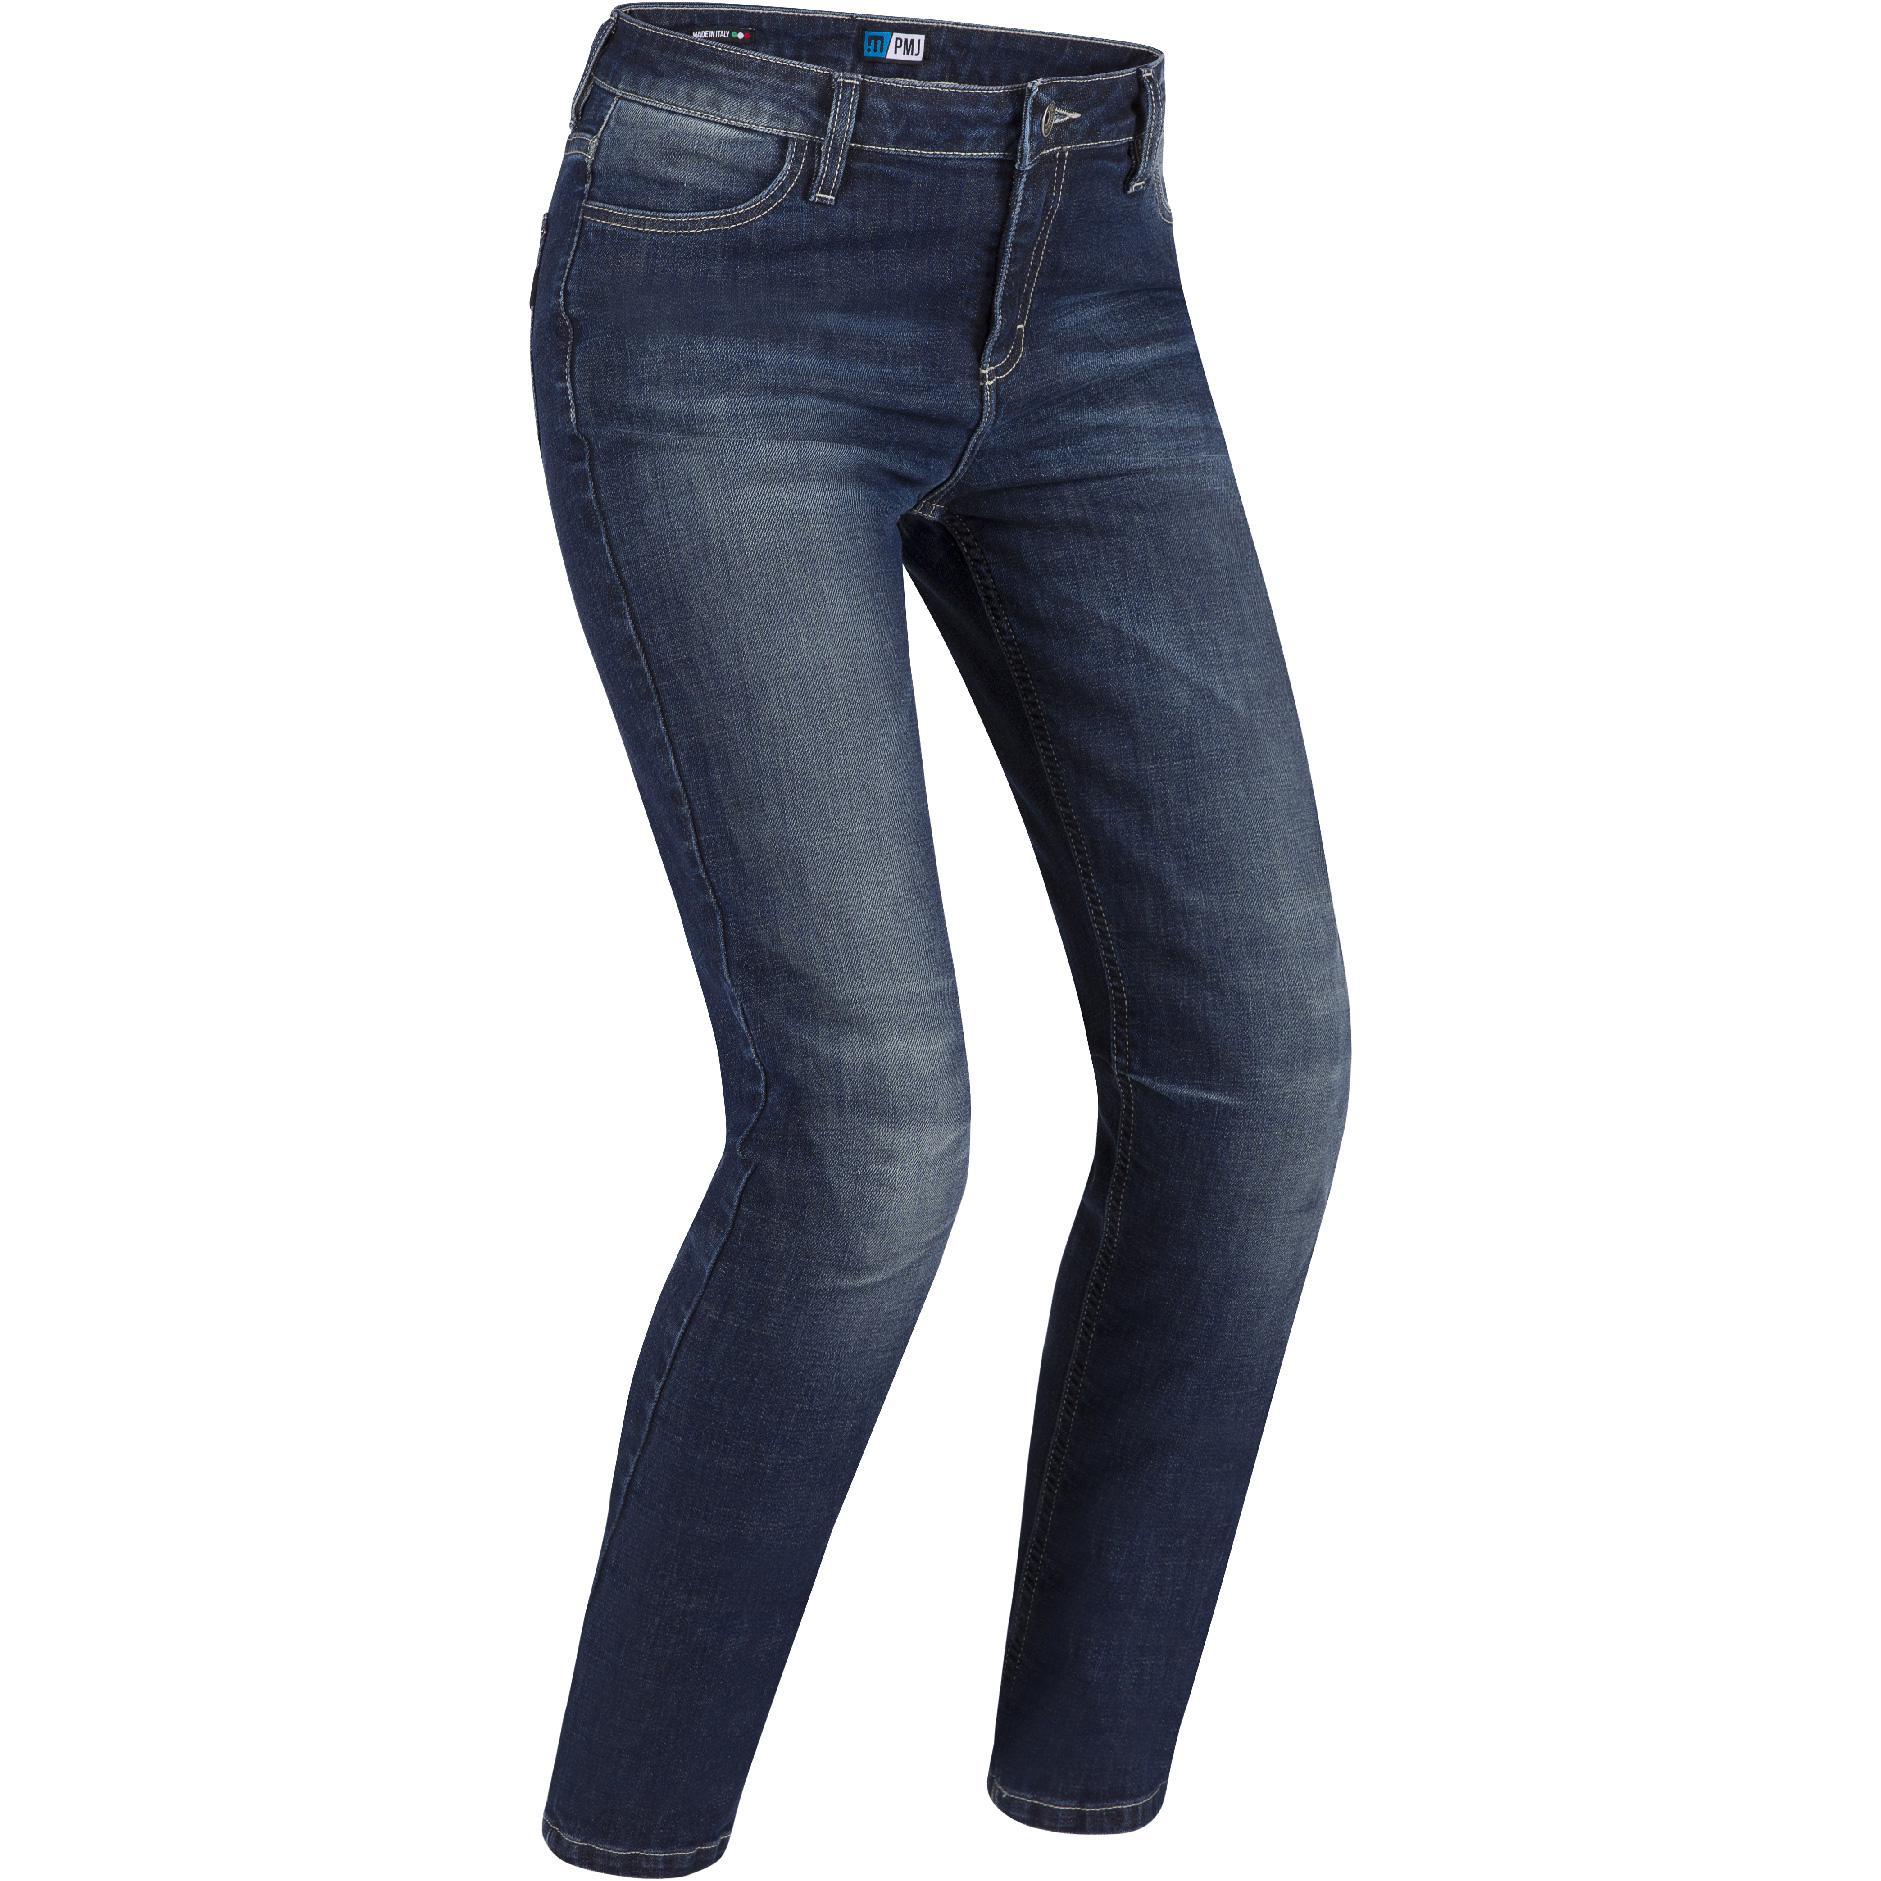 Jeans NEW RIDER LADY PMJ